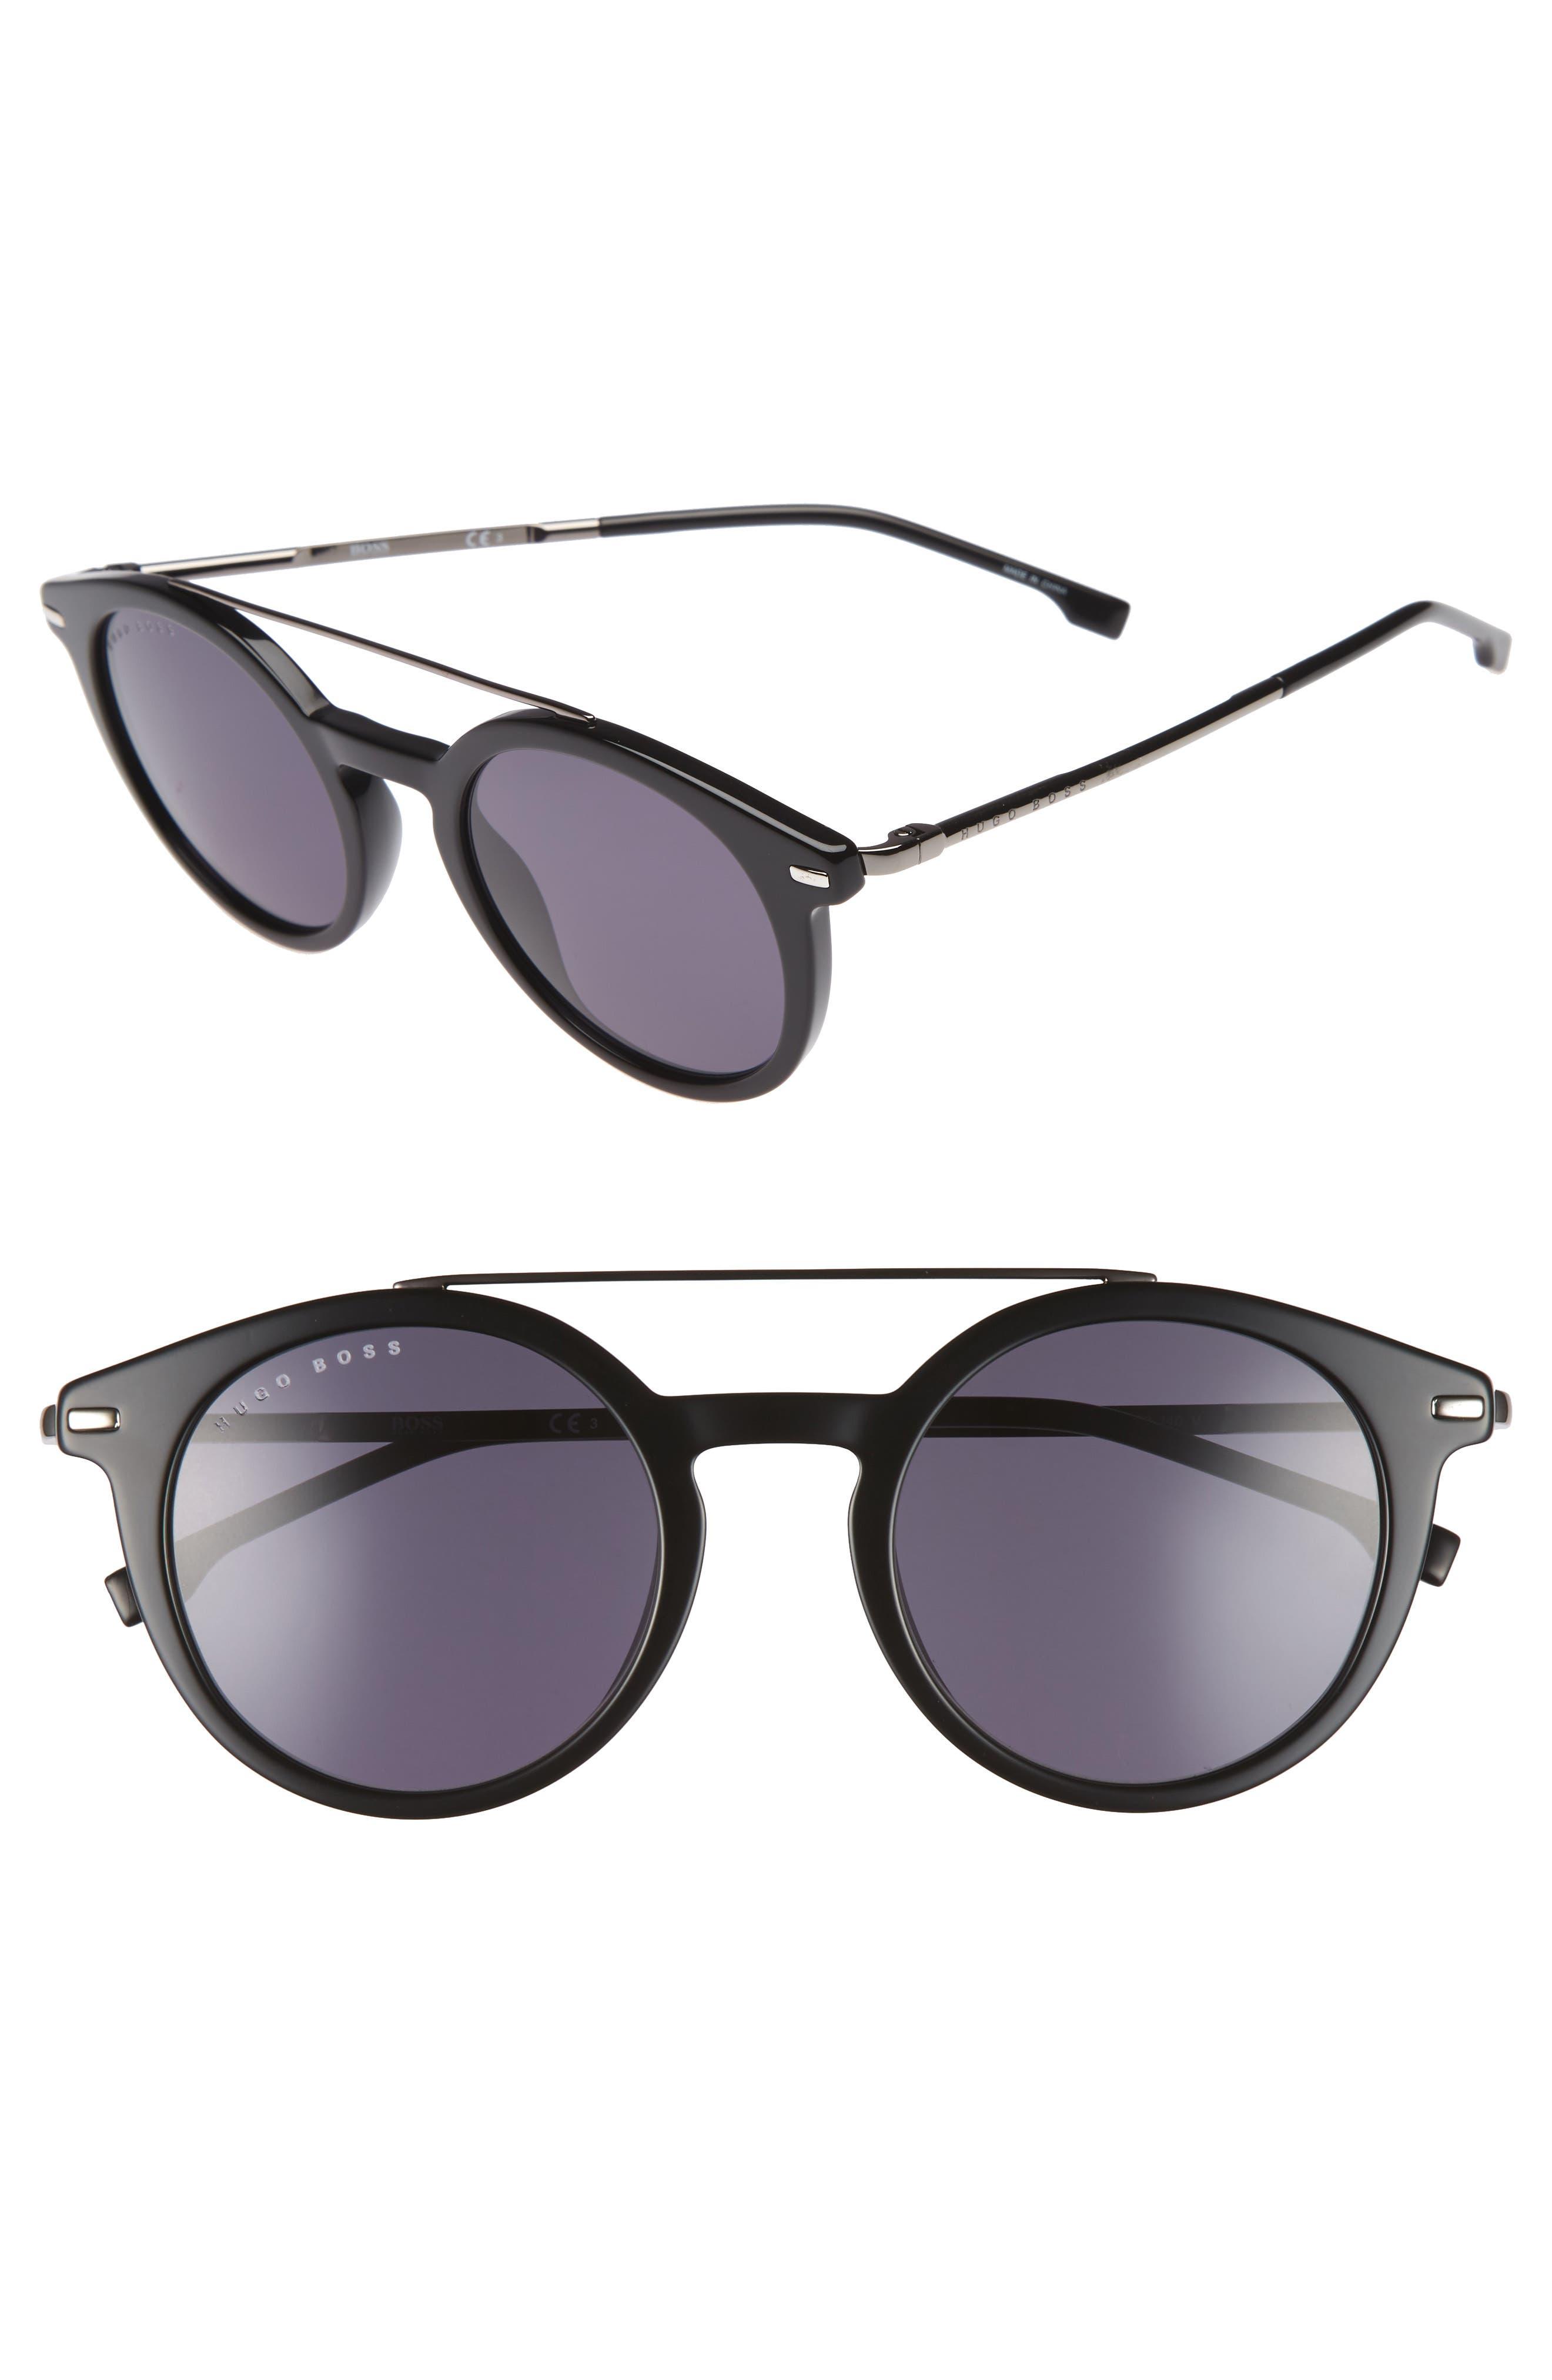 Main Image - BOSS B0926S 49mm Polarized Sunglasses